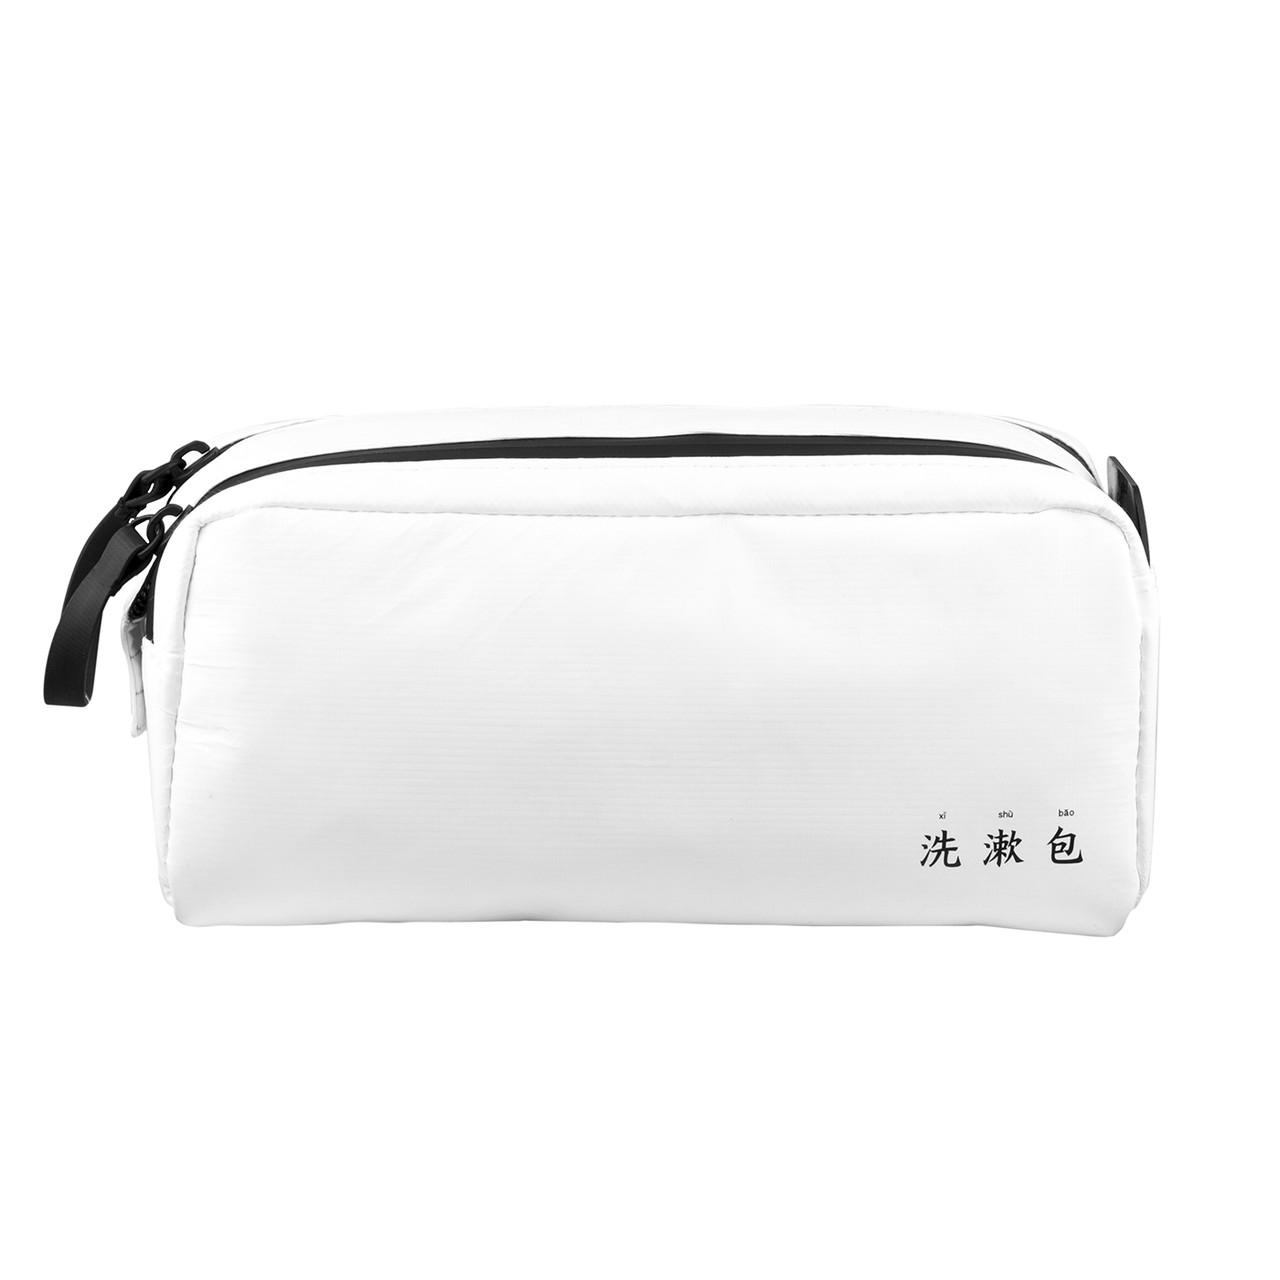 Сумка органайзер Xiaomi Ninetygo Tyvek Washing Bag,  White